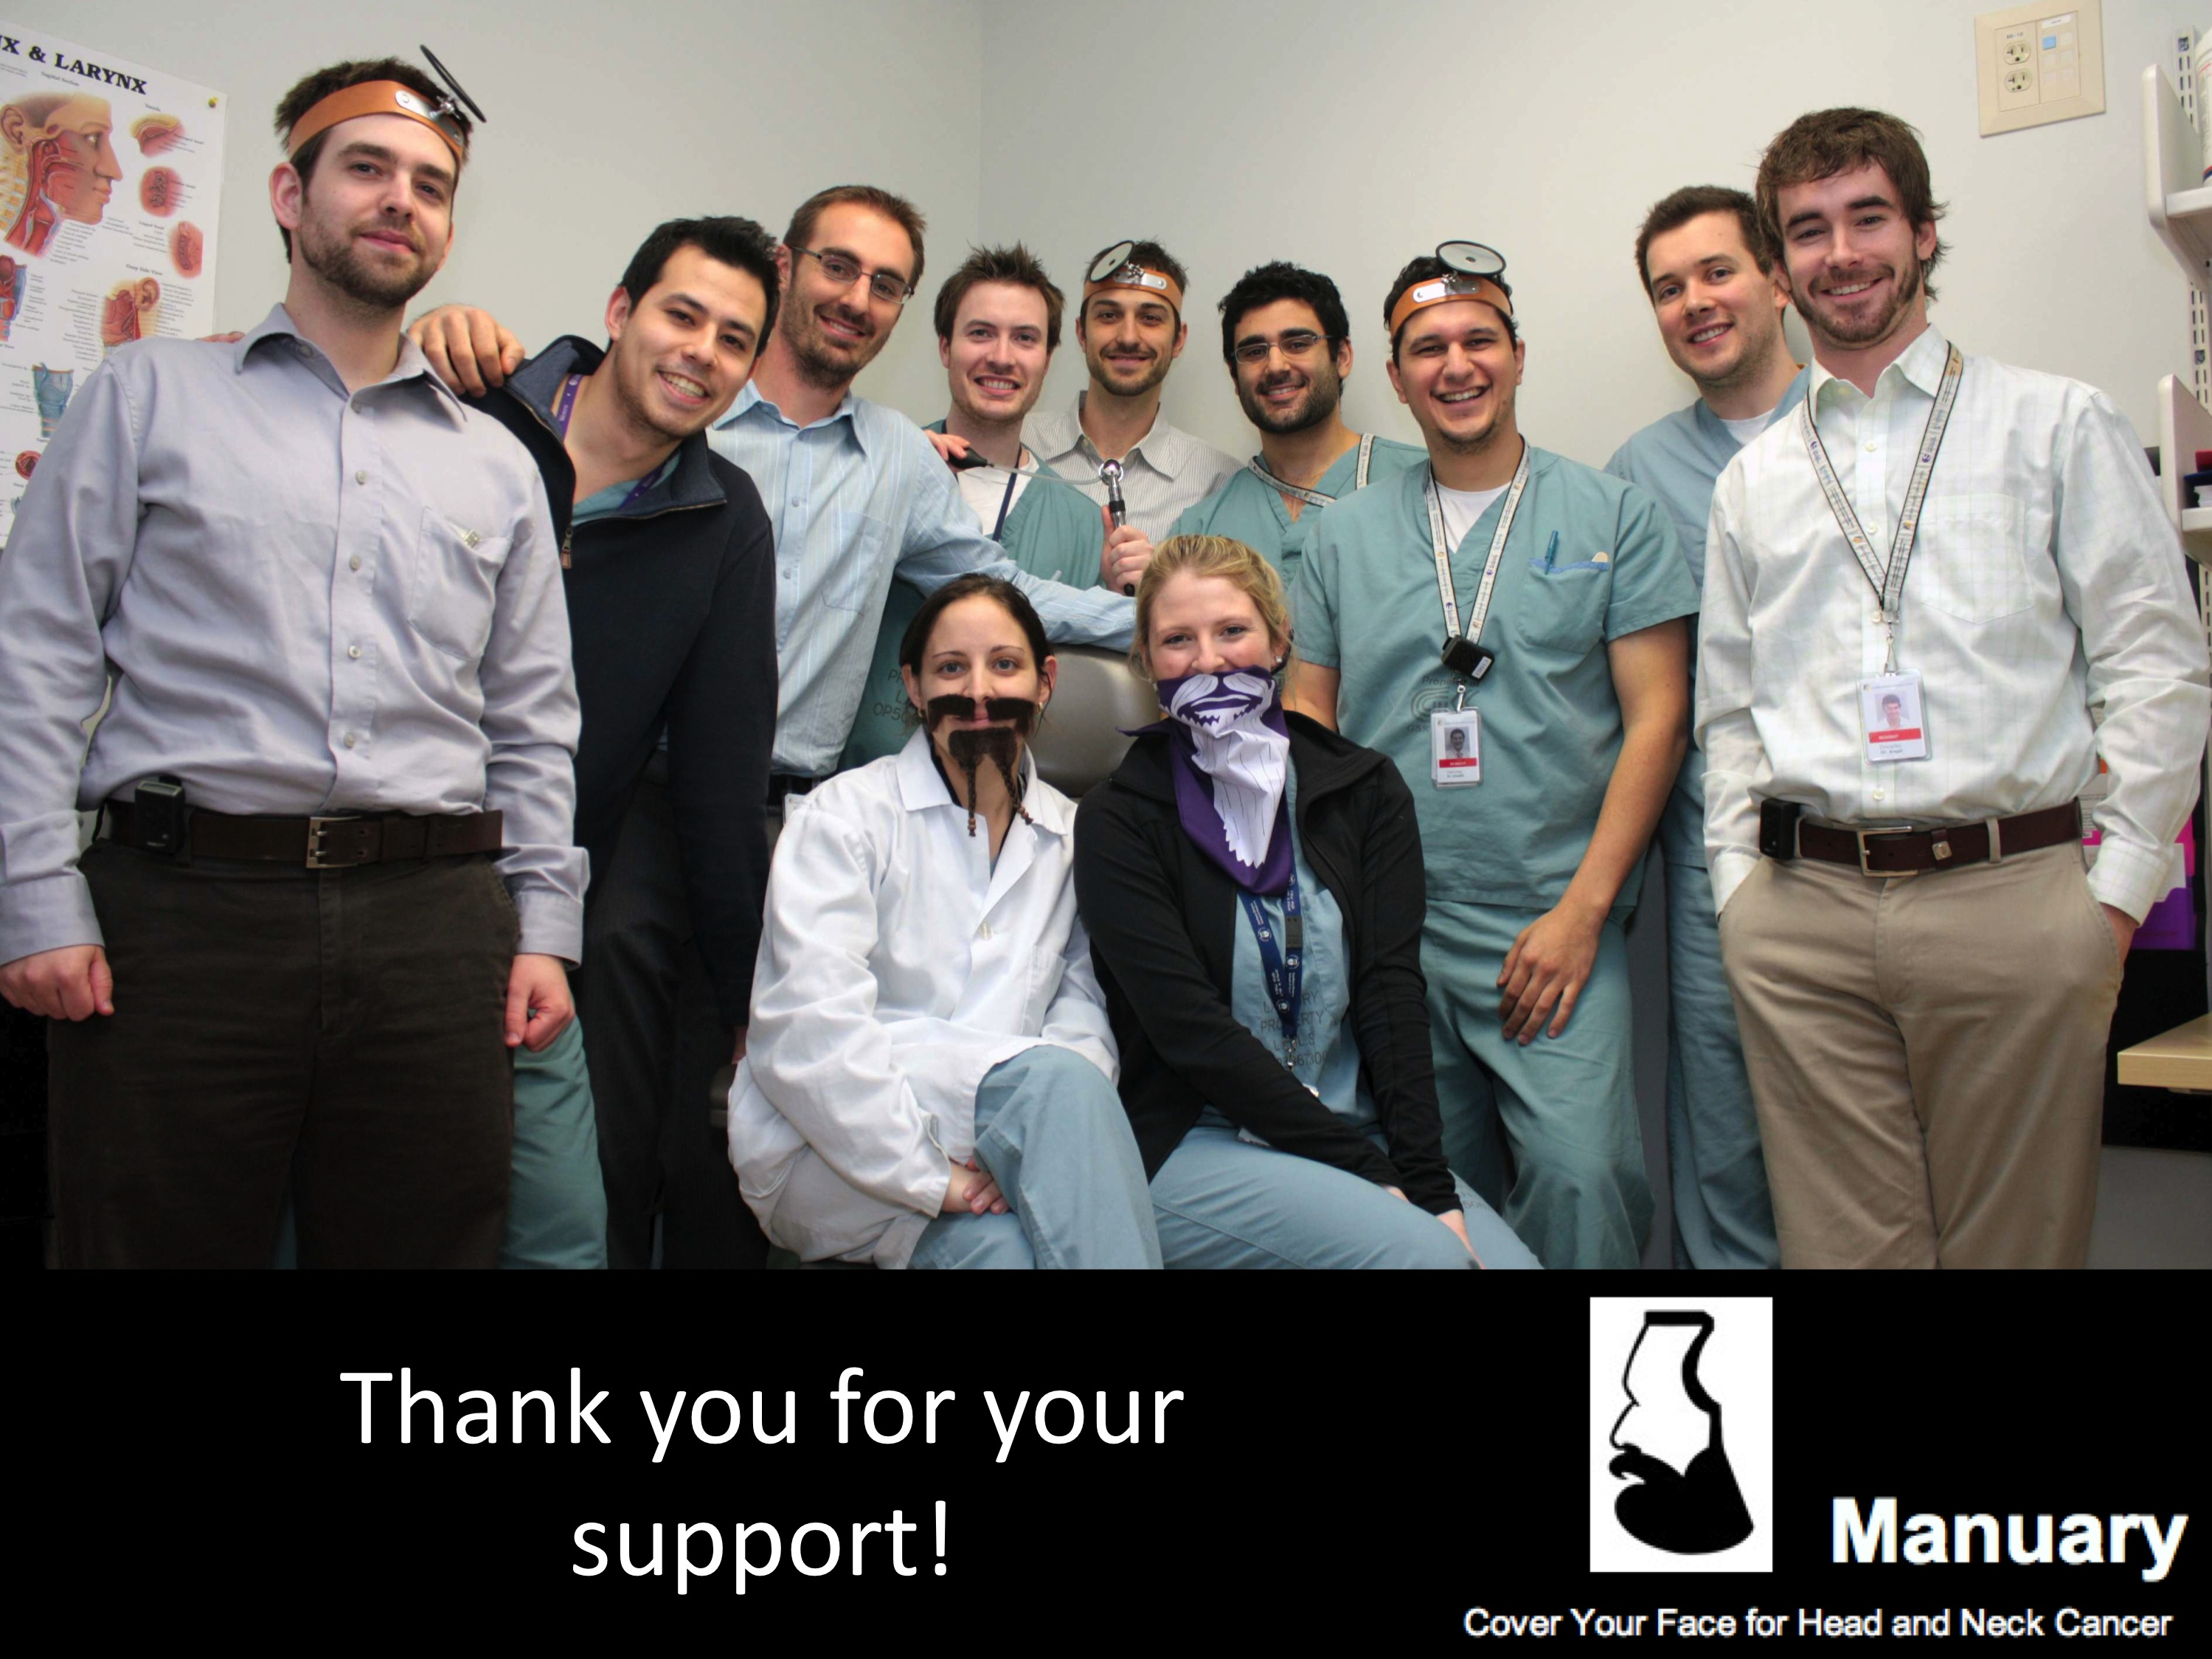 Manuary team in Canada. Manuary_beards_cancer_head_neck